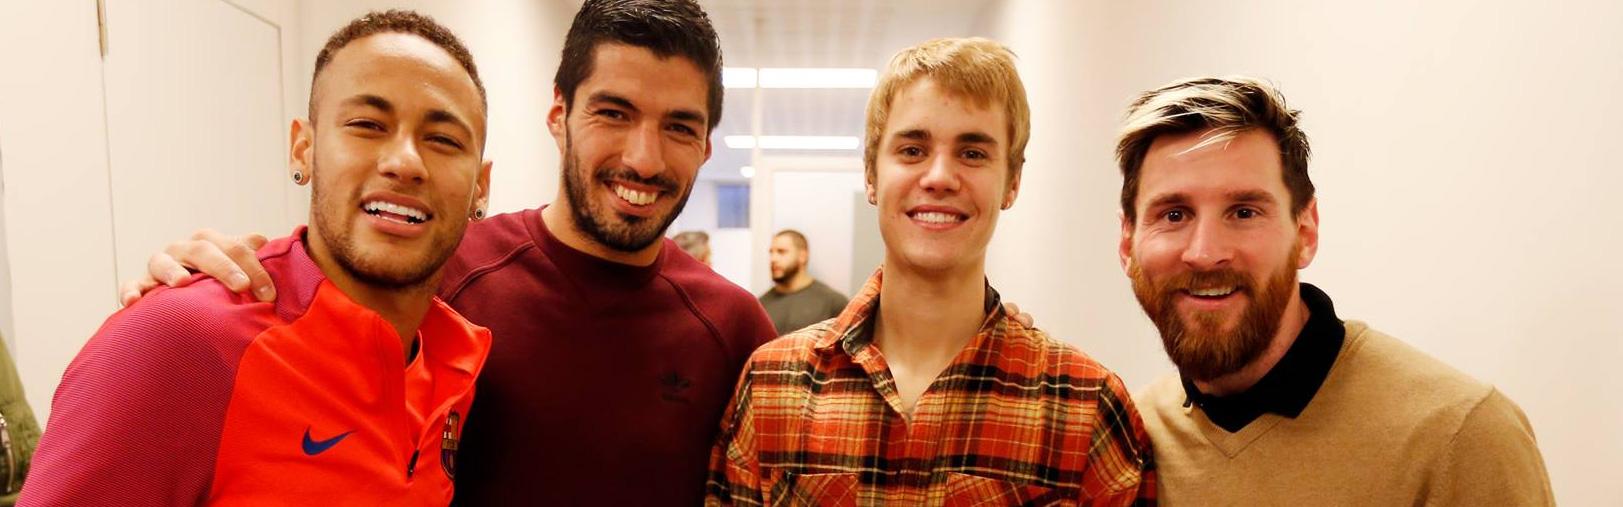 Bieberbarcelonalang